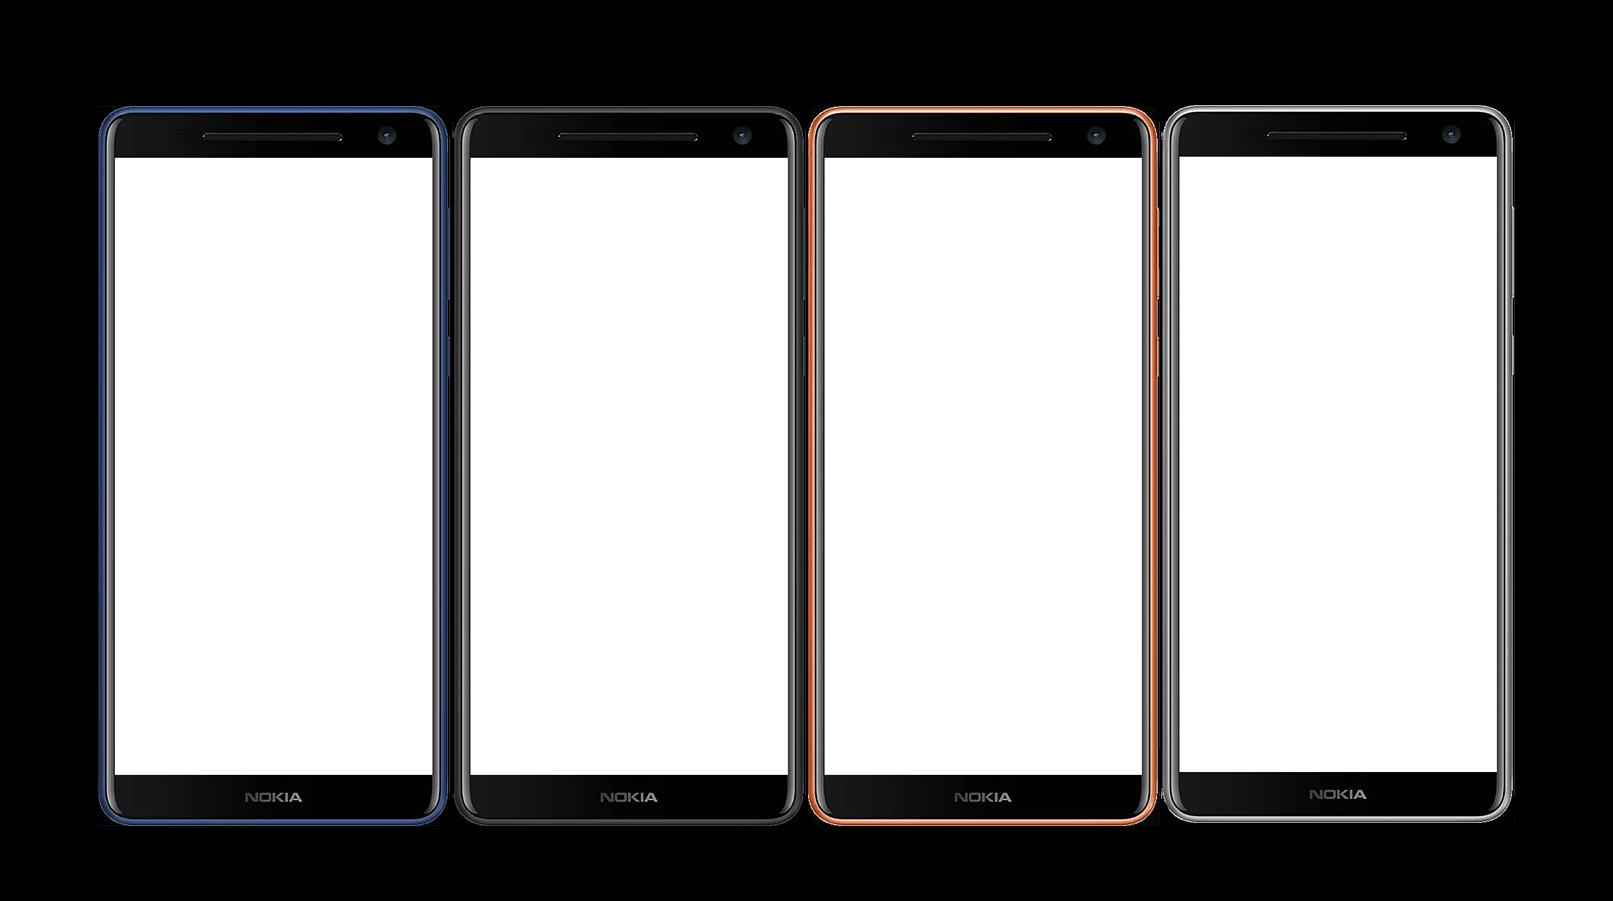 Nokia 9 Renders from front leaked in various colors, 16:9 Display Confirmed 1